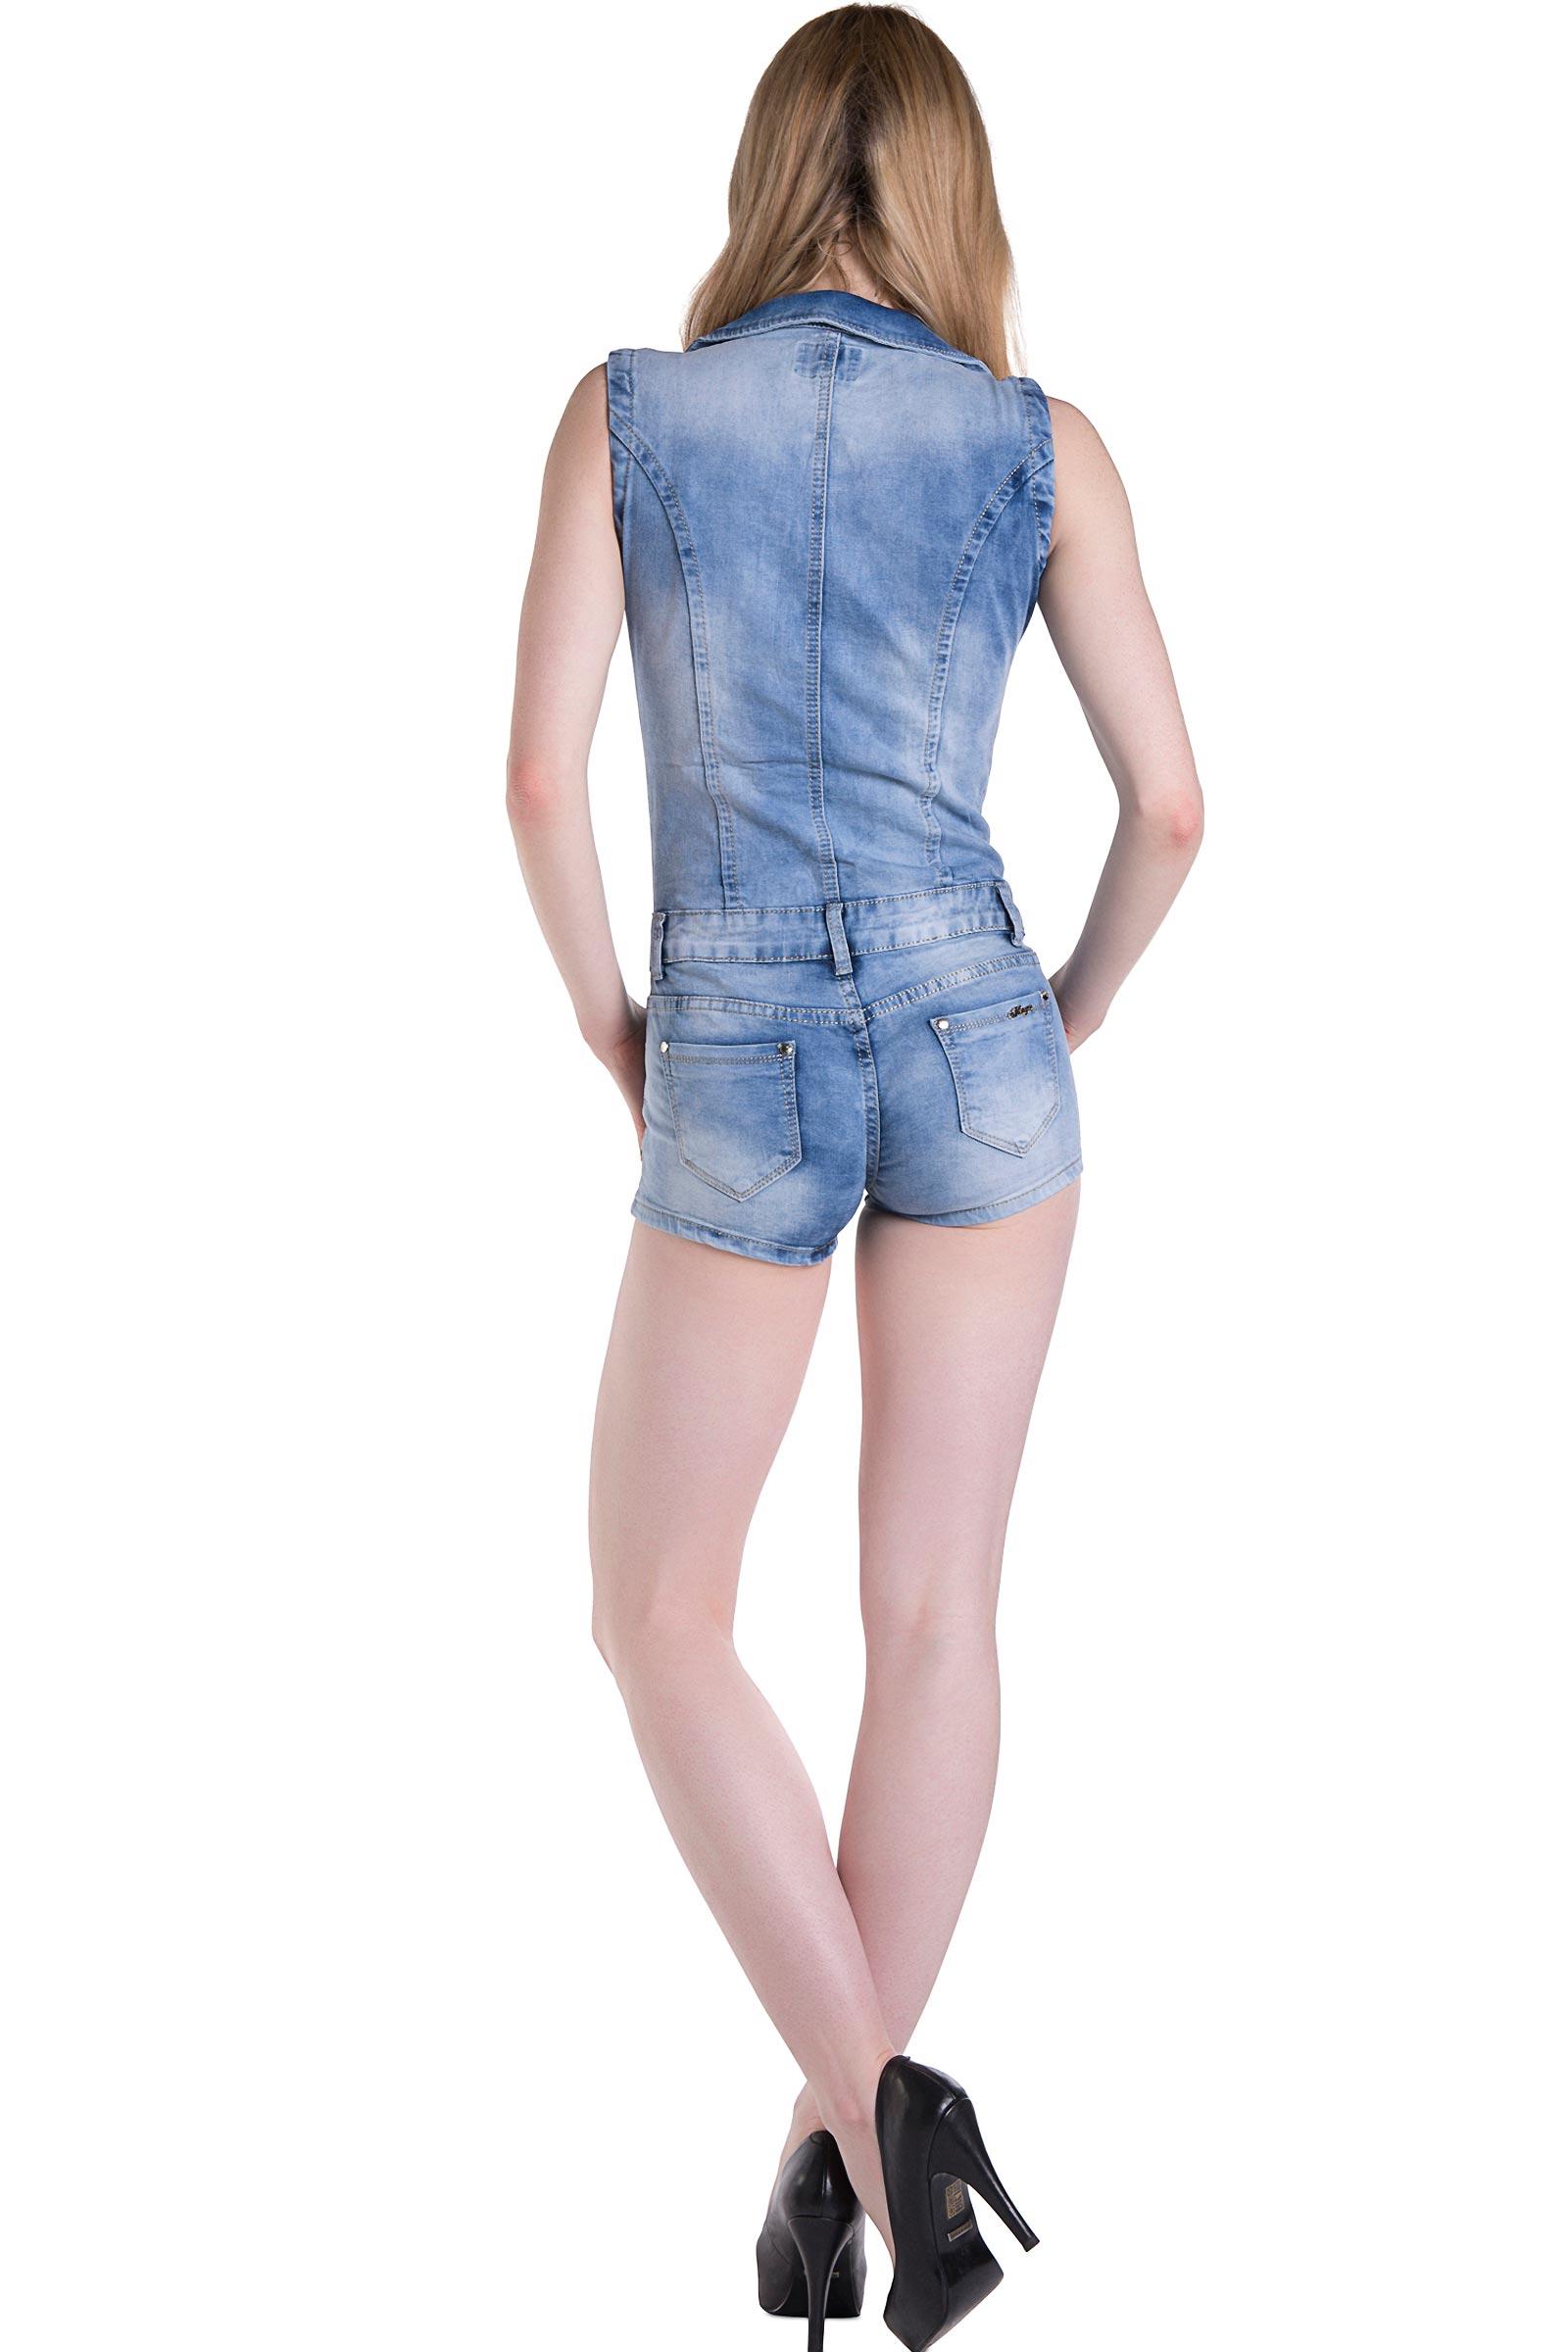 Womens Size 30 Jeans Conversion